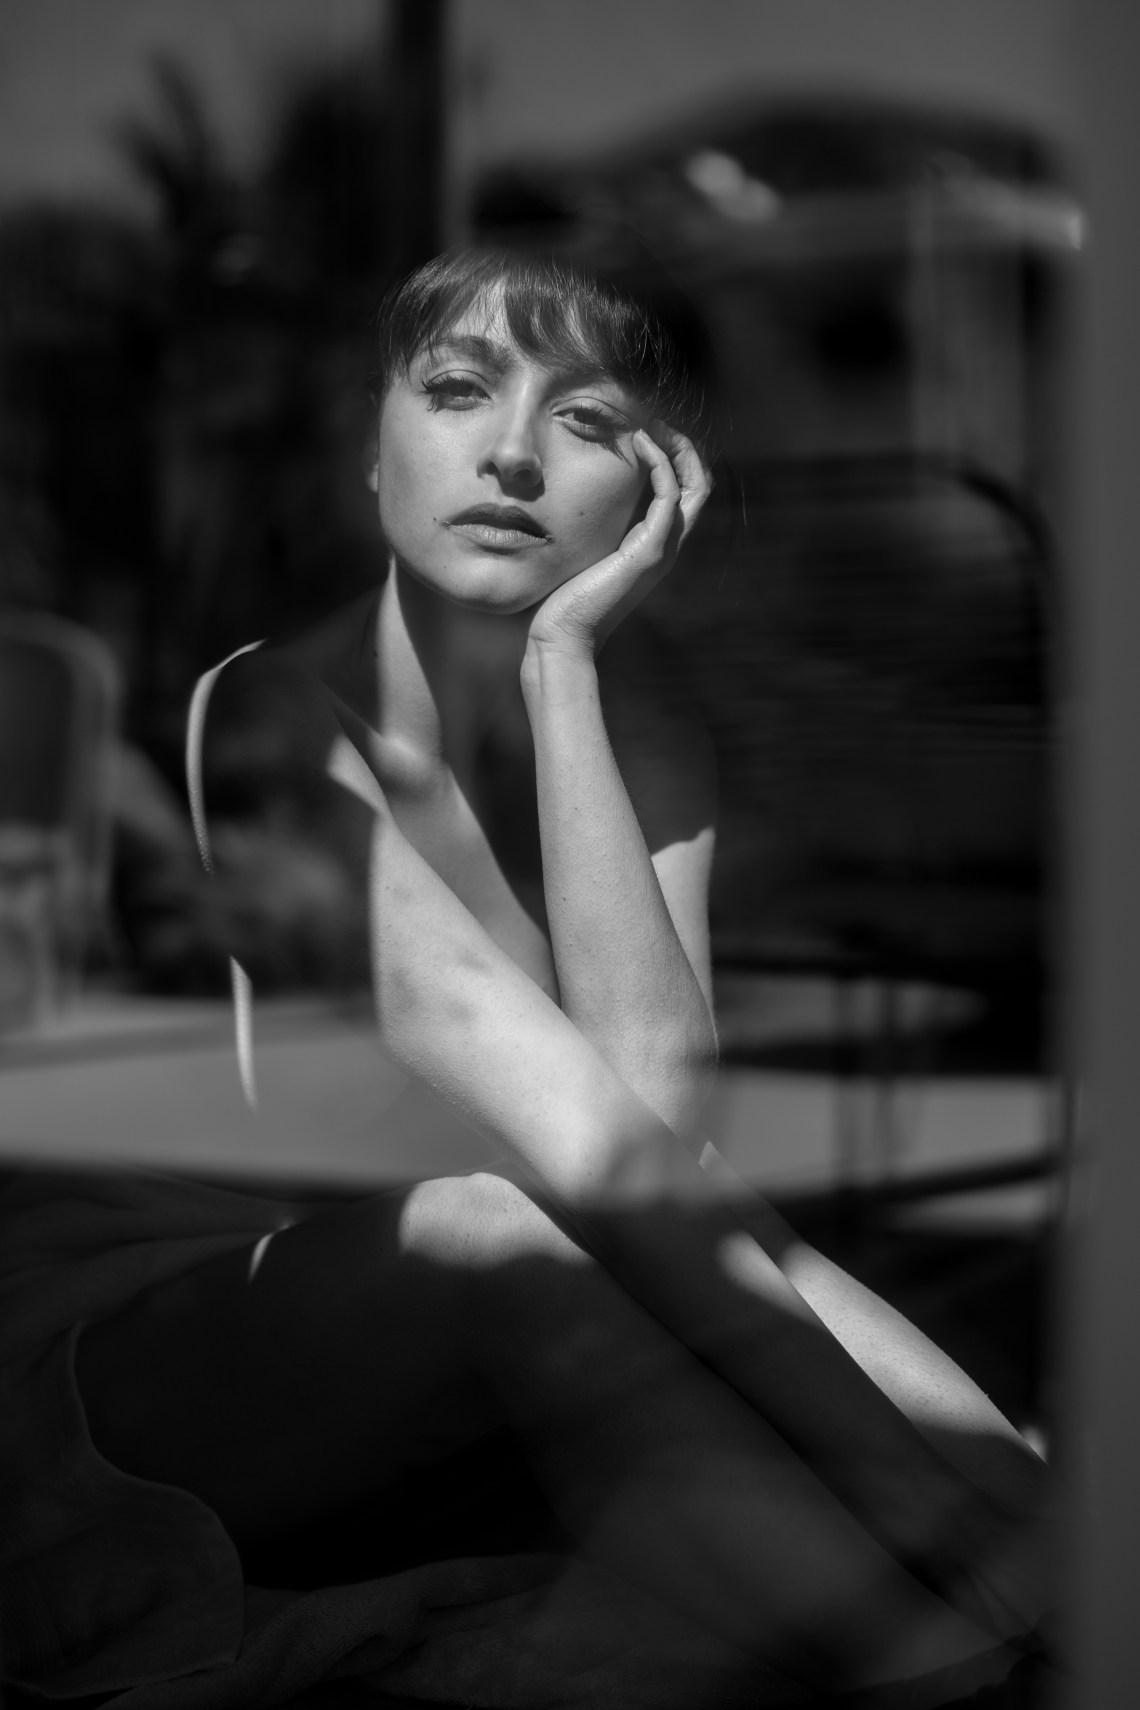 woman sitting looking sad